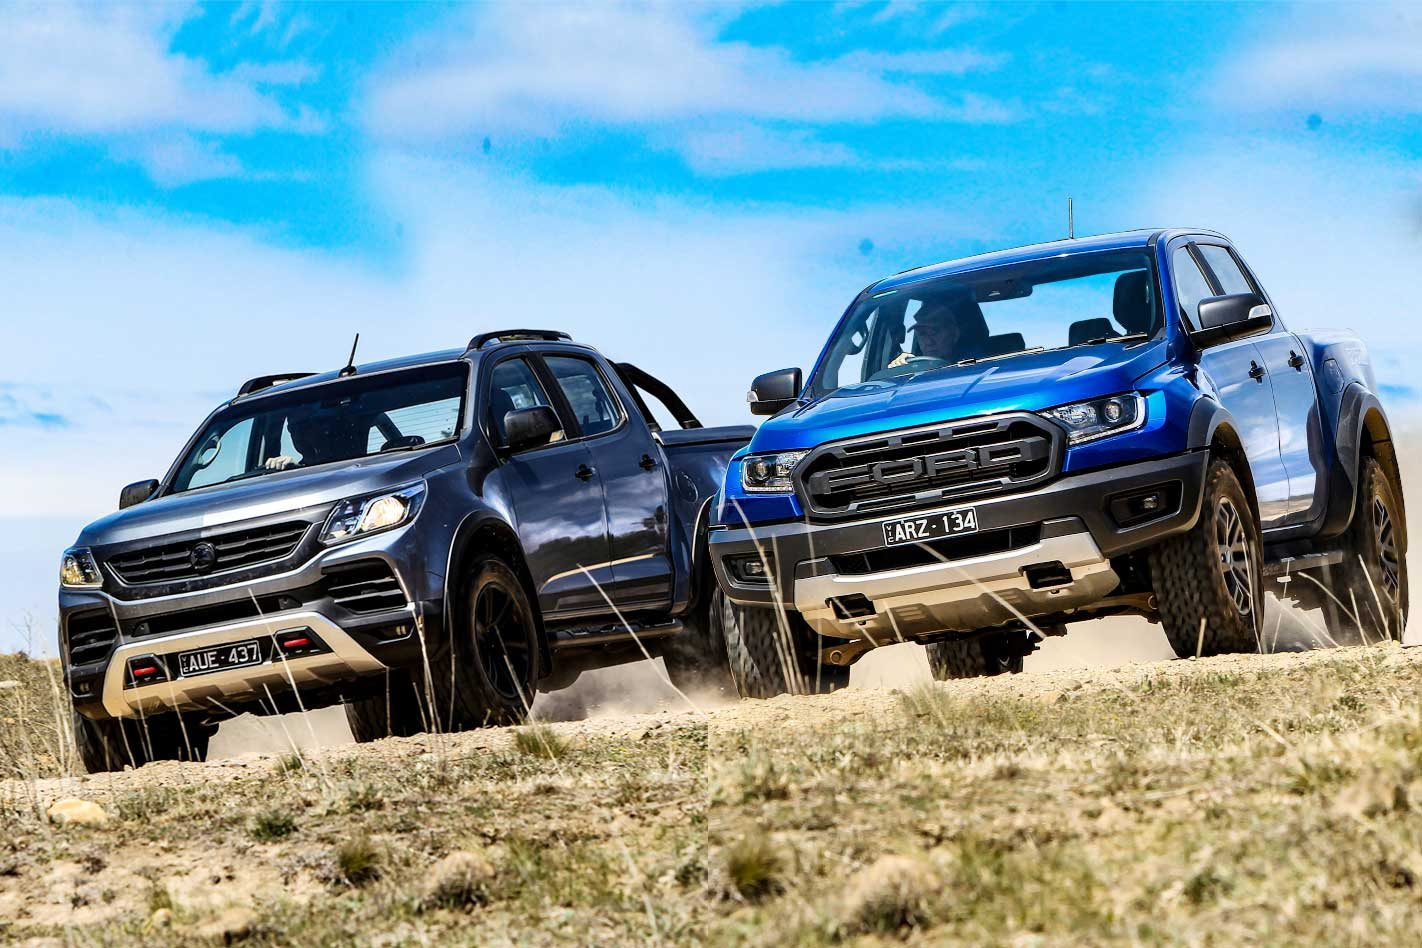 2018 Hsv Colorado Sportscat Vs Ford Ranger Raptor 4x4 Comparison Review